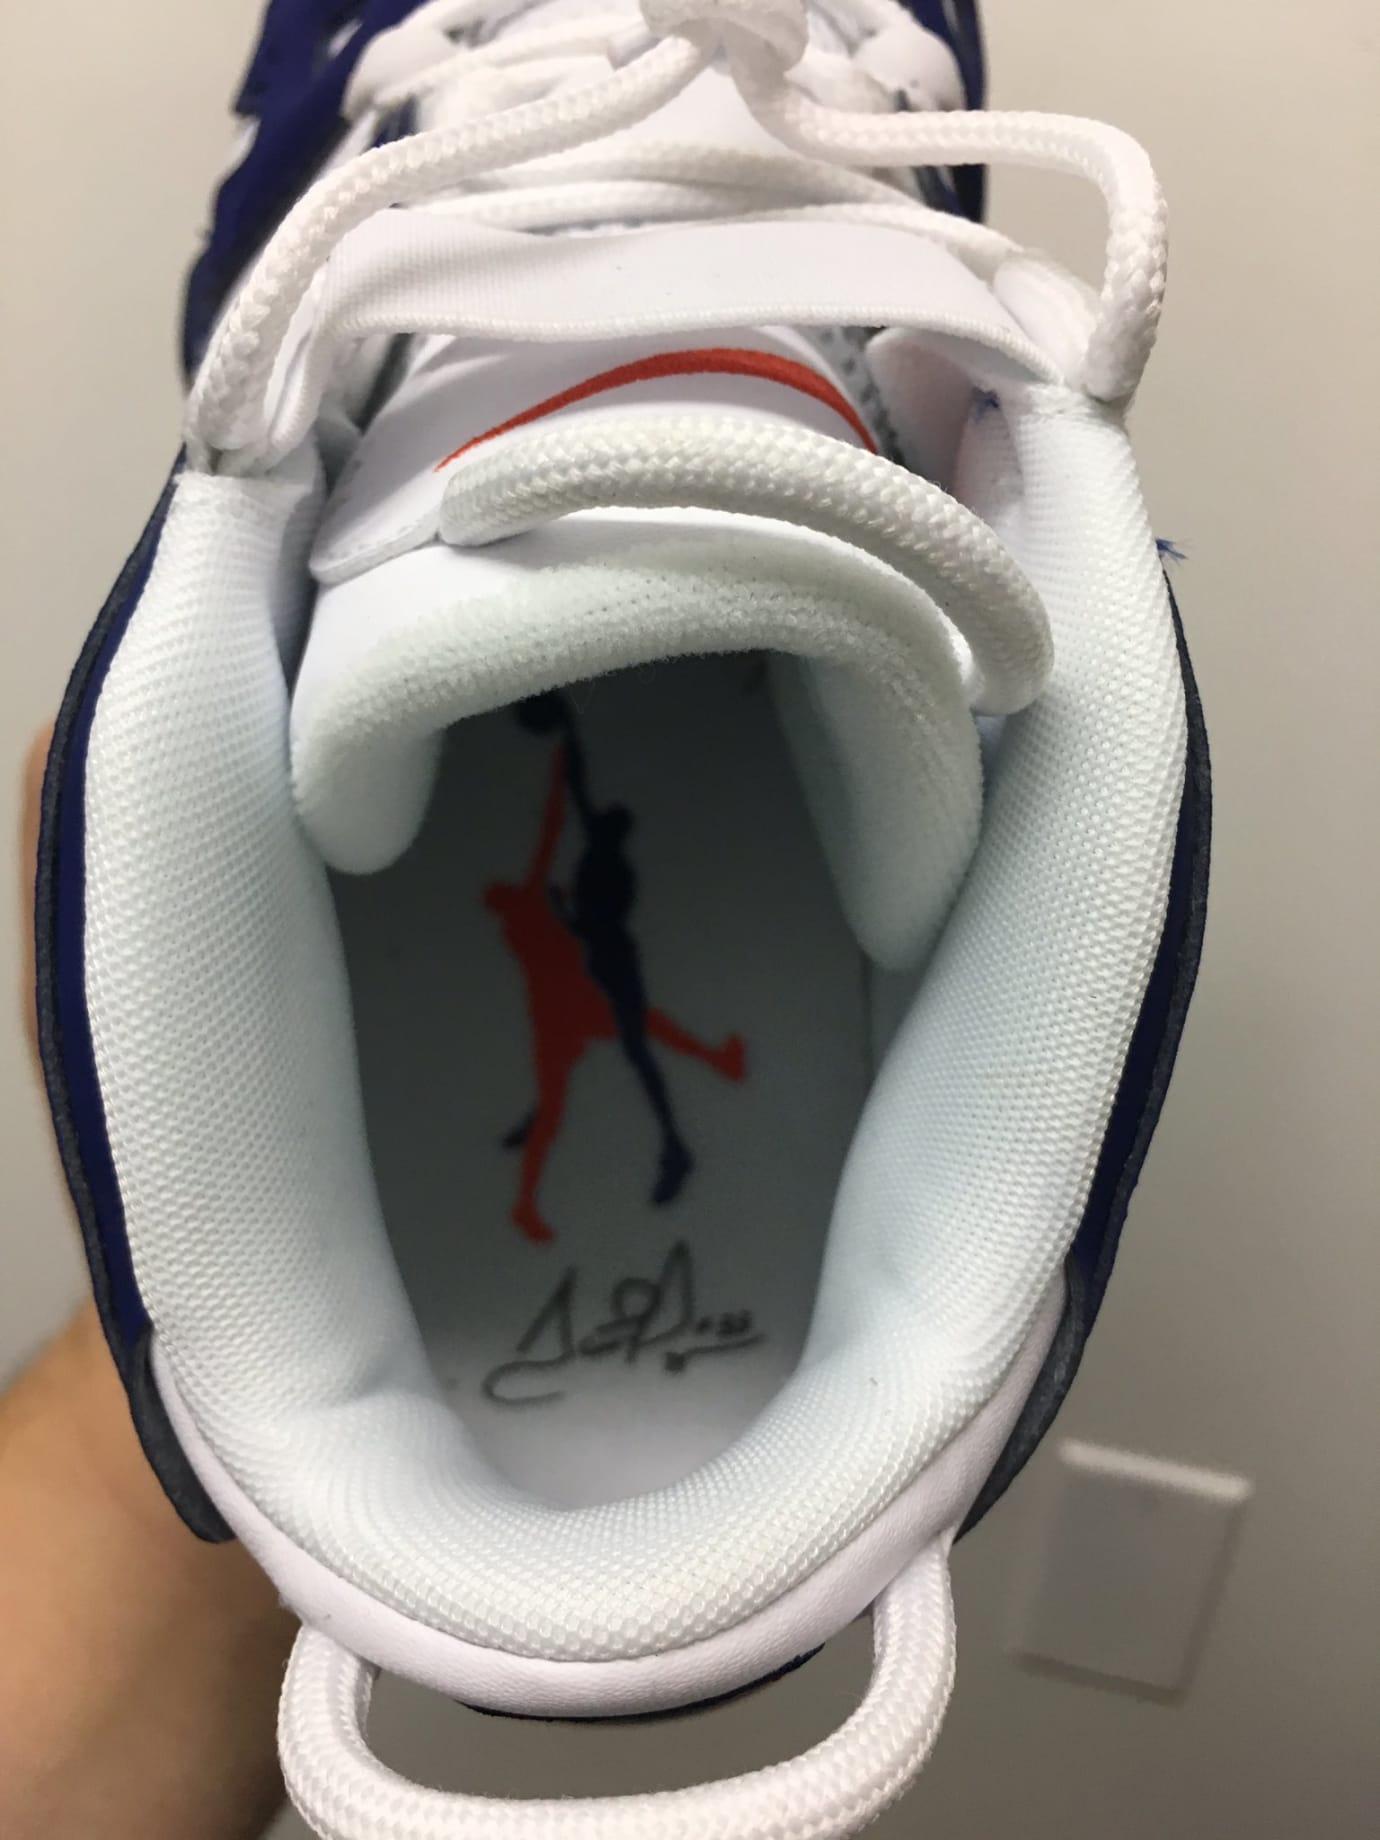 d0c63fe642 Nike Air More Uptempo Scottie Pippen Patrick Ewing Knicks Dunk ...